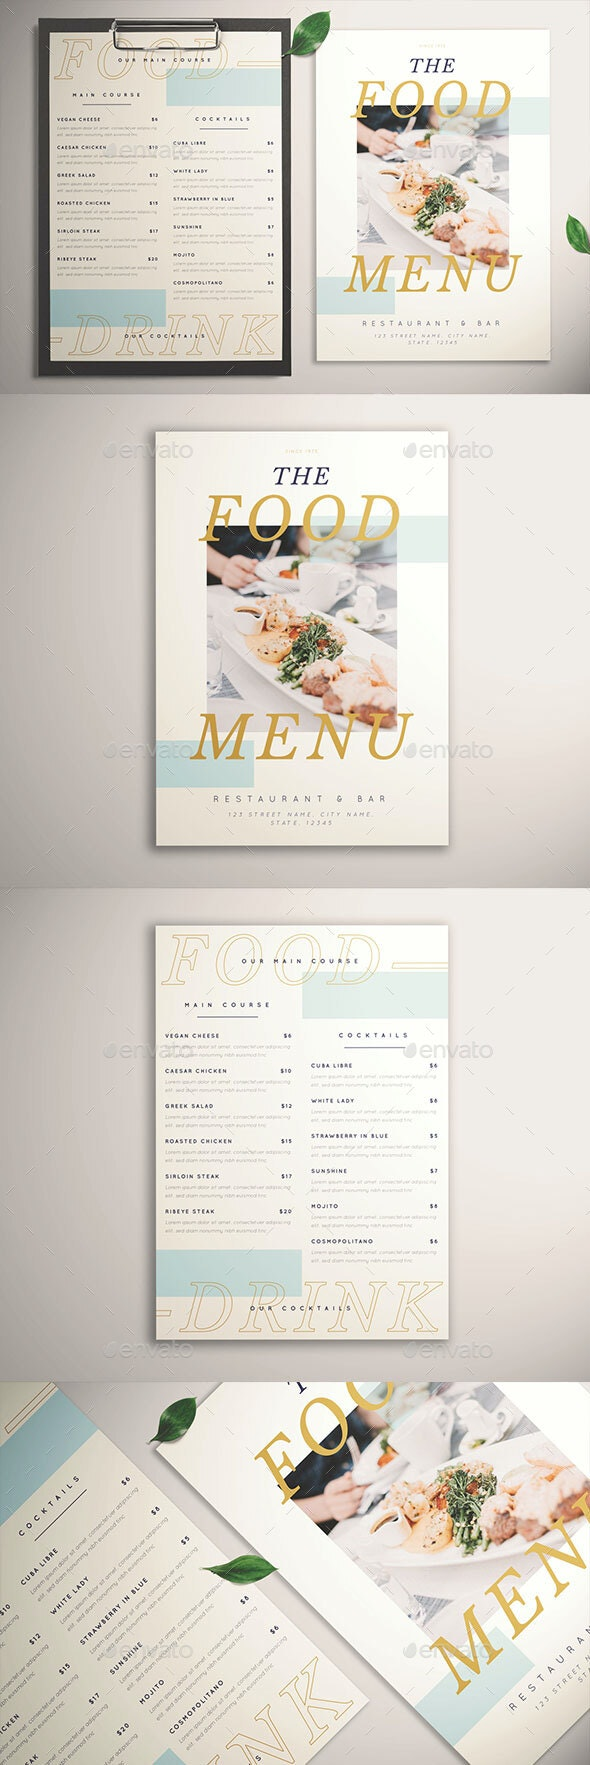 Hipstery Food Menu - Restaurant Flyers